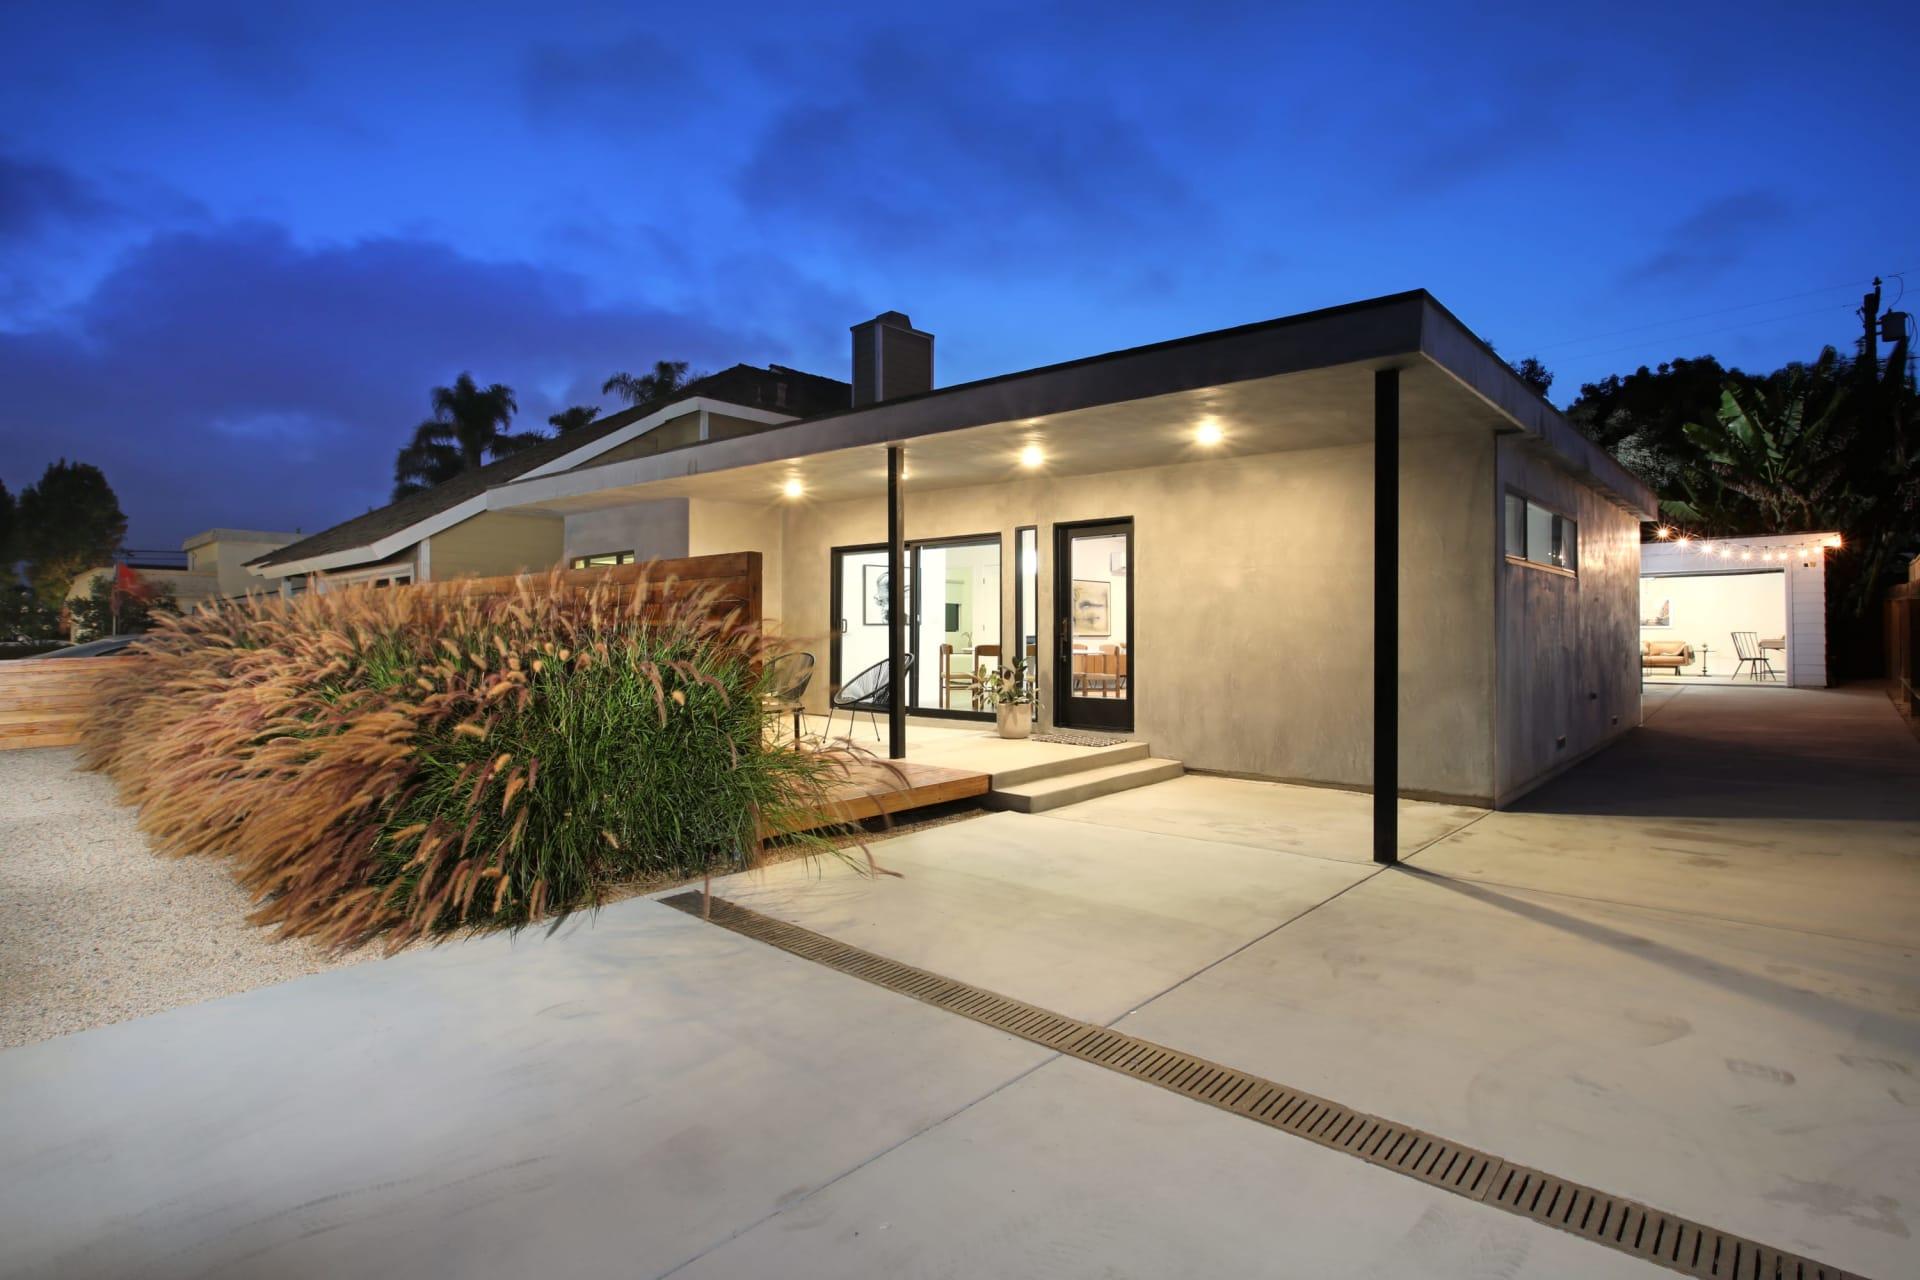 615 Irvine Ave photo